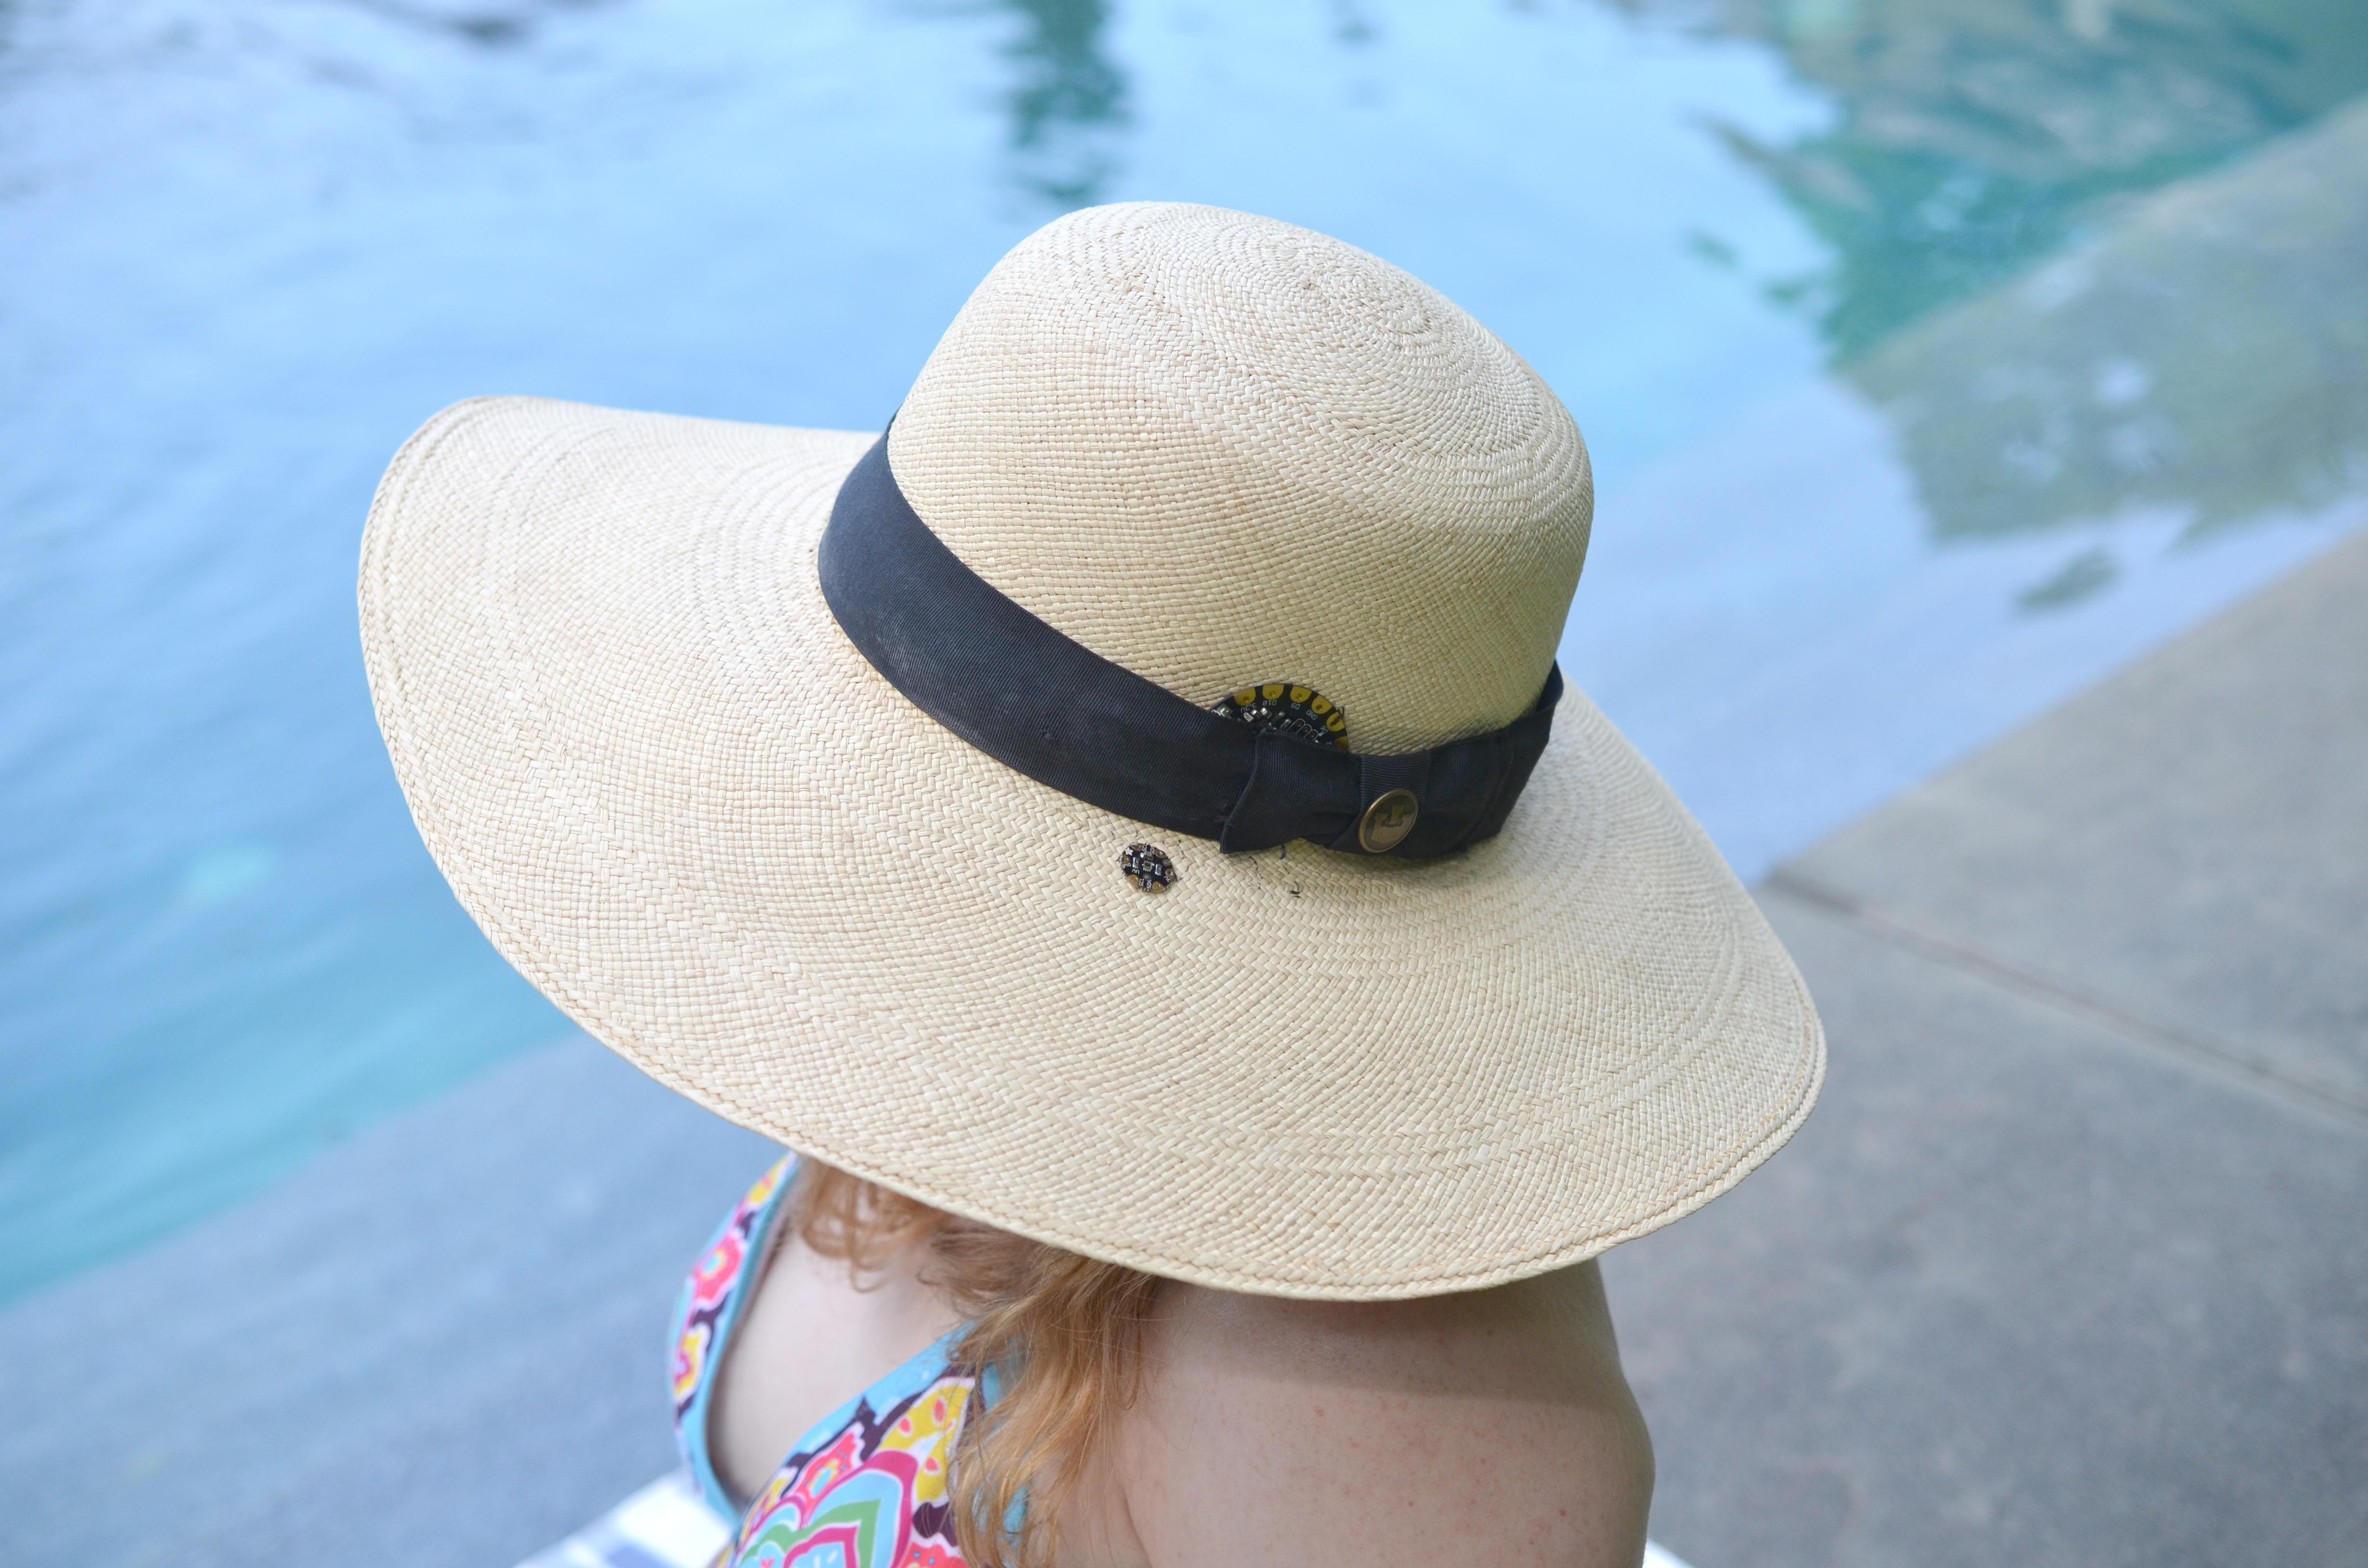 light_sunscreen-reminder-hat-poolside-becky-stern.jpg